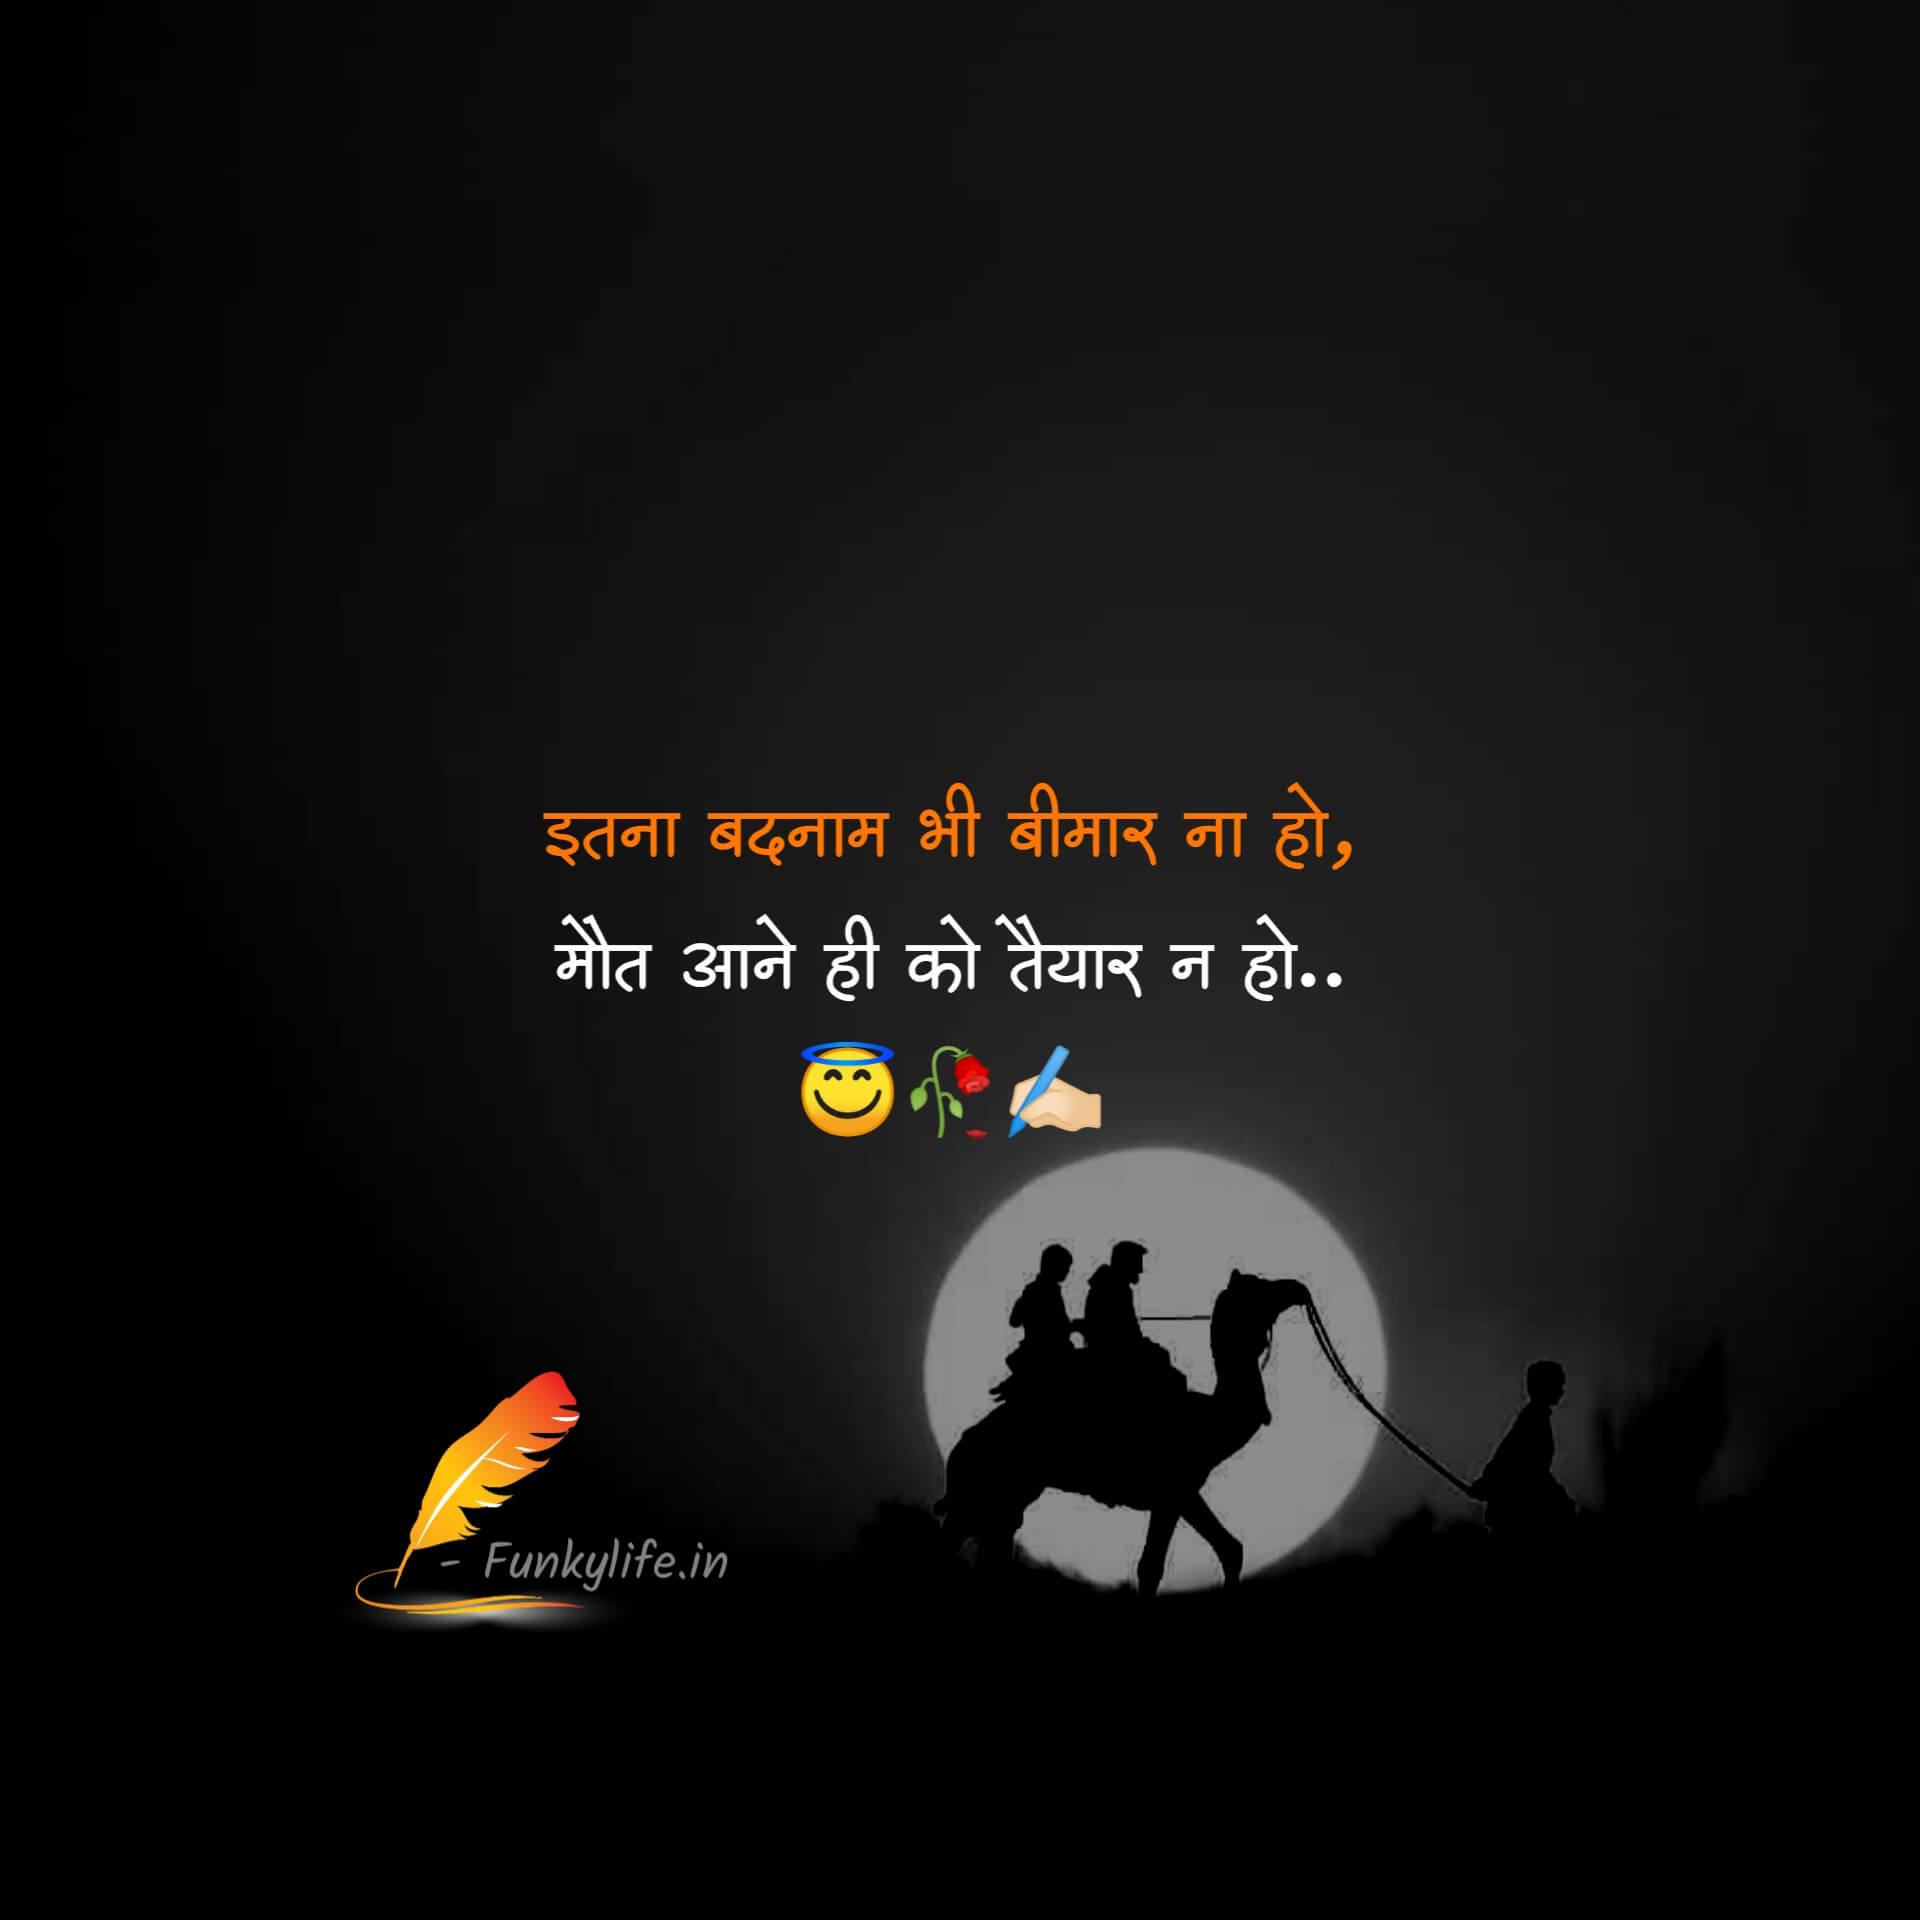 Alfaaz Shayari in Hindi Image #22